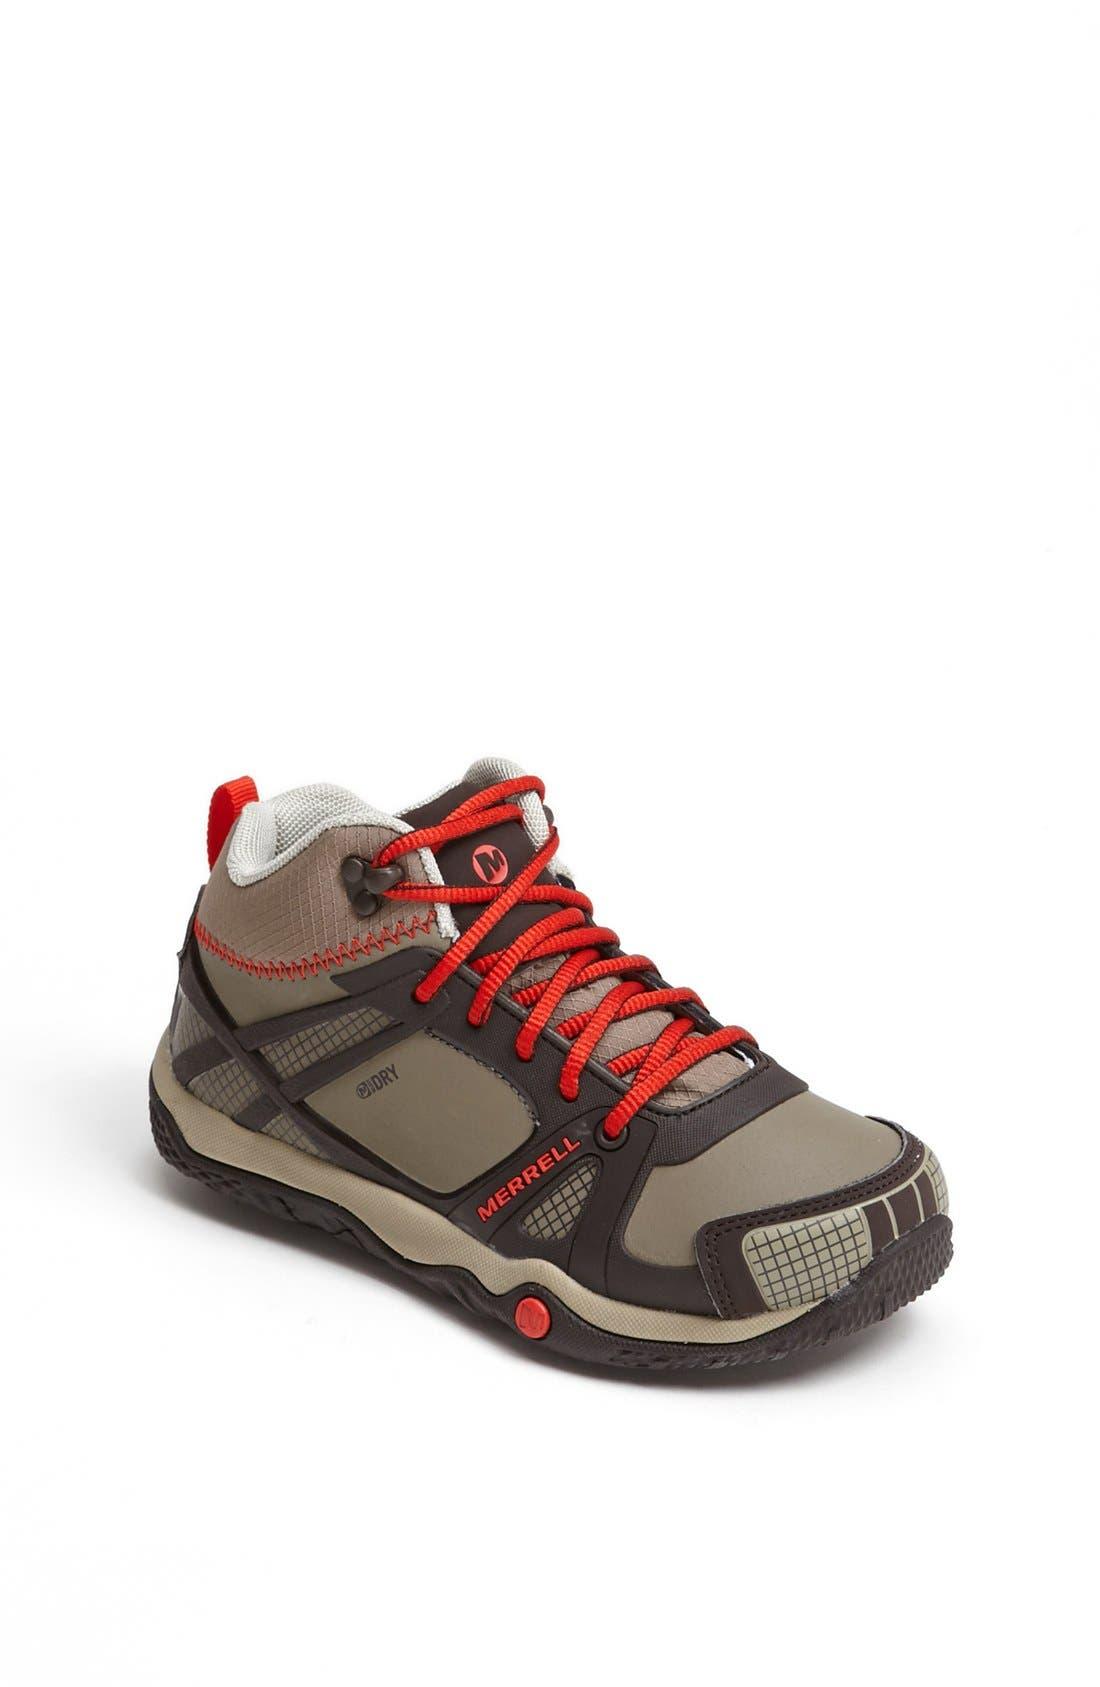 MERRELL 'Proterra' Mid High Waterproof Sneaker, Main, color, 201